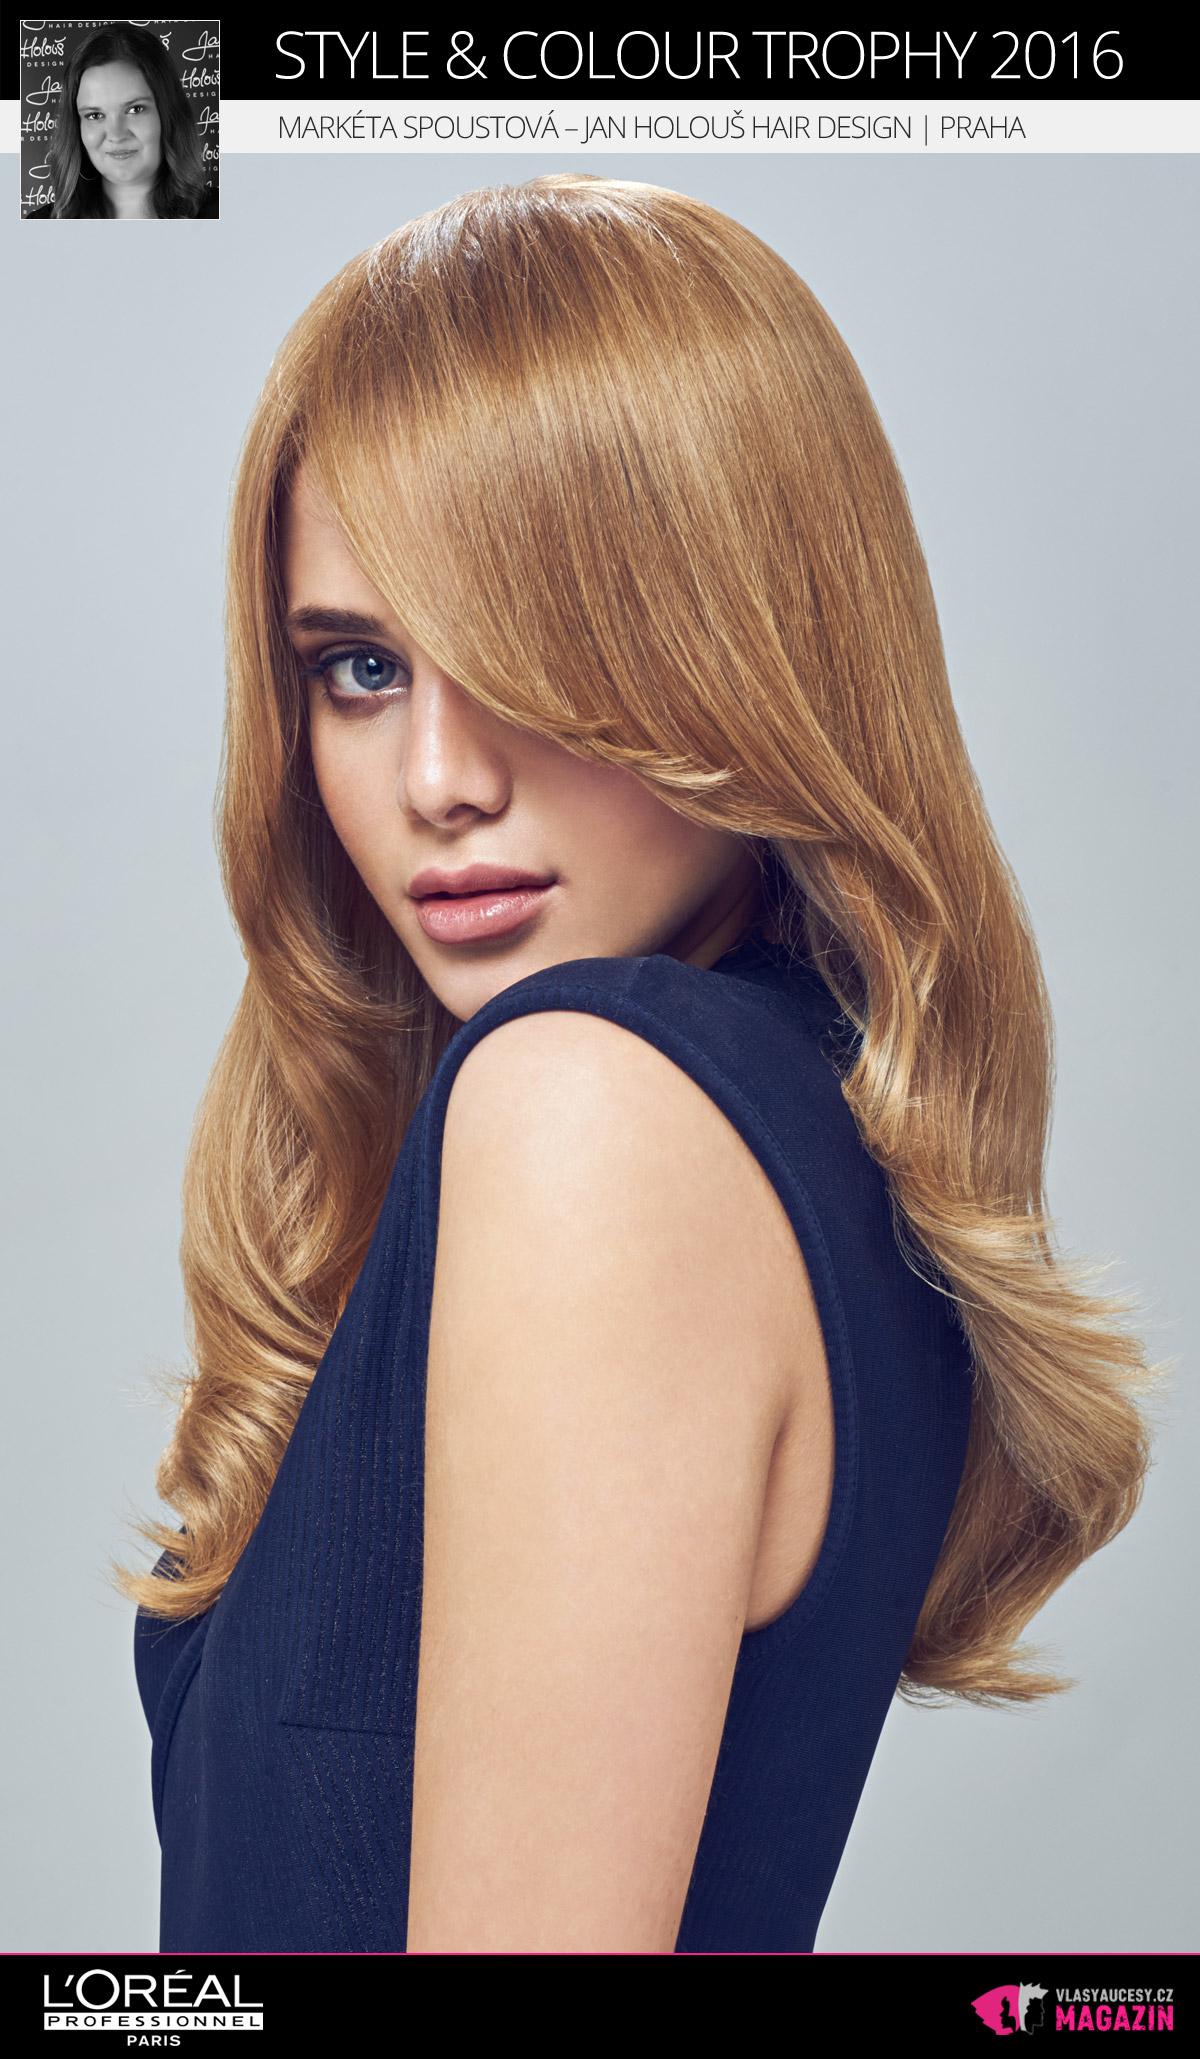 Markéta Spoustová – Jan Holouš Hair Design, Praha   L'Oréal Style & Colour Trophy 2016